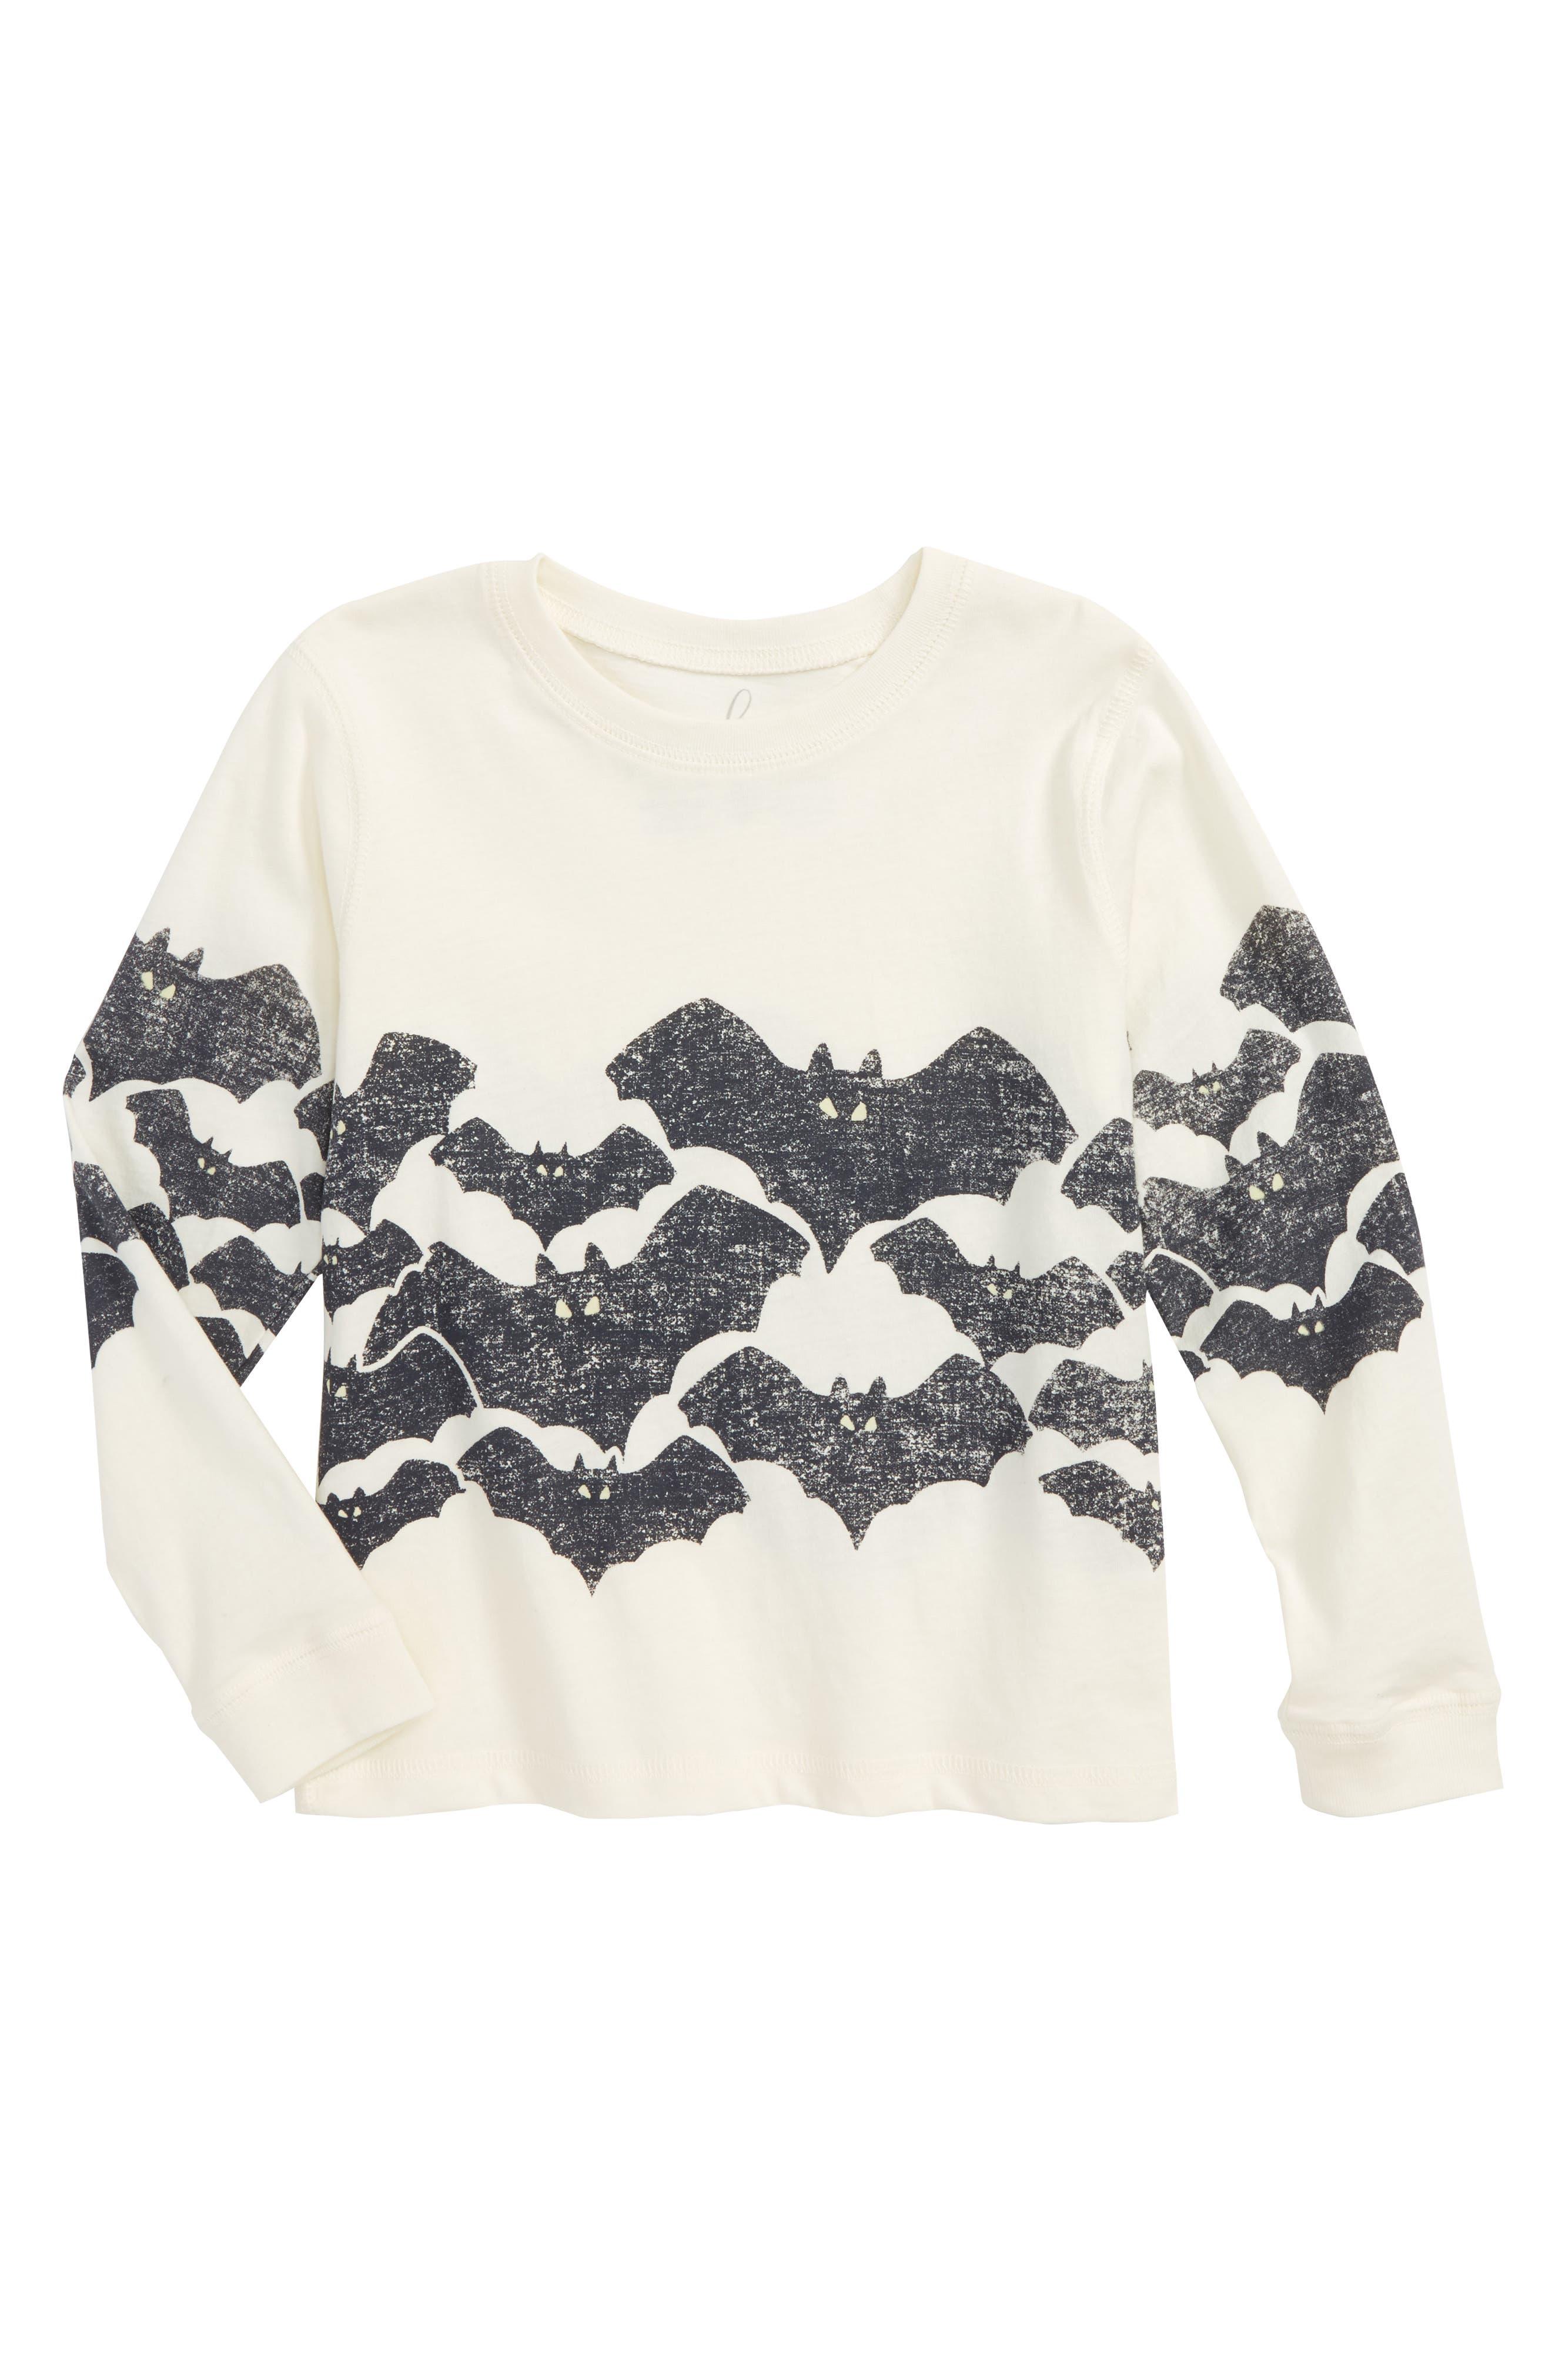 Alternate Image 1 Selected - Peek Bats Glow in the Dark T-Shirt (Toddler Boys, Little Boys & Big Boys)